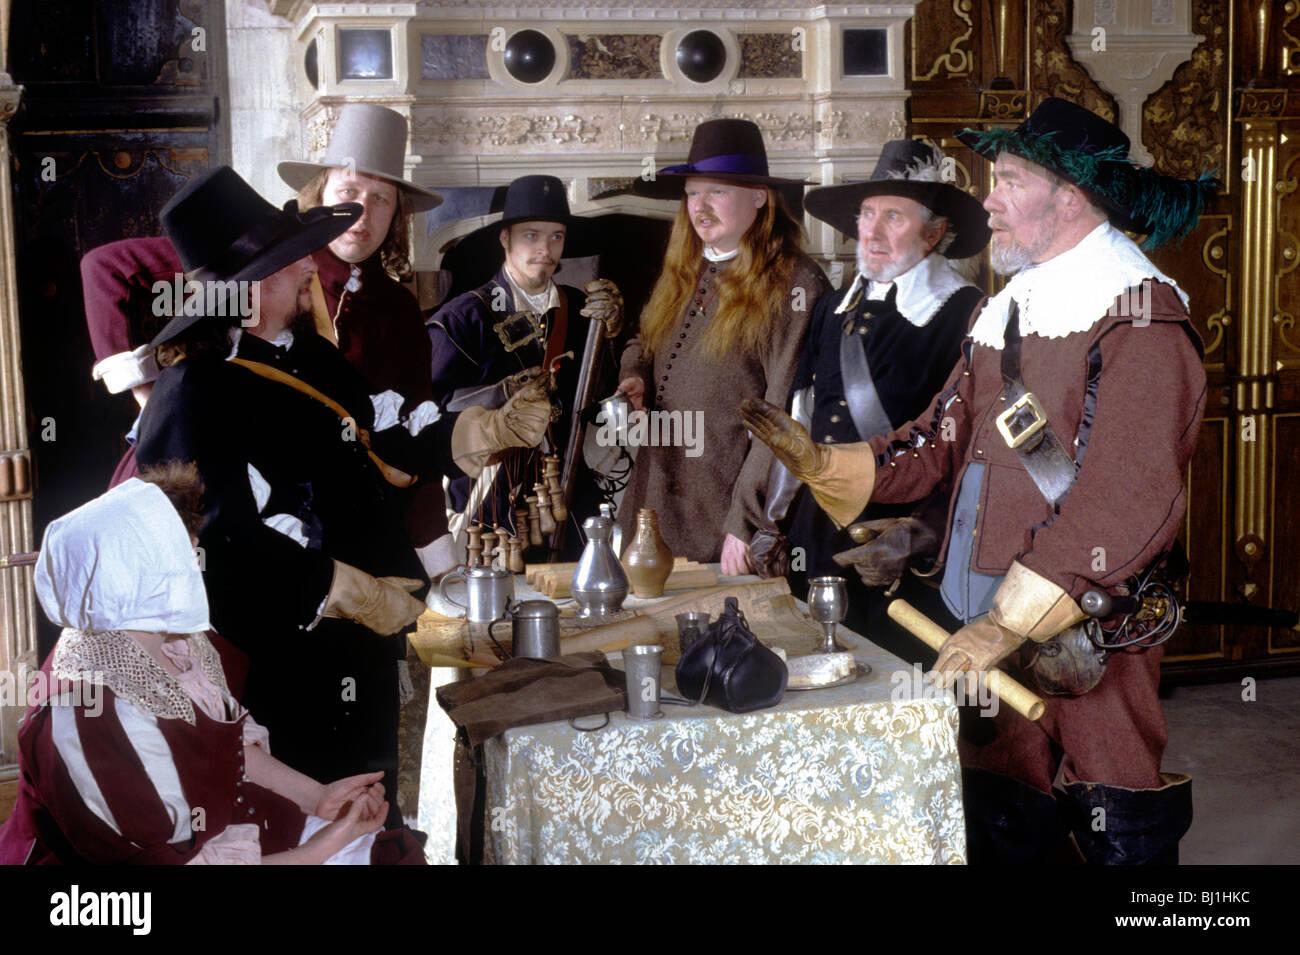 English Civil War period historical re-enactment British English military history uniform uniforms dress costume - Stock Image